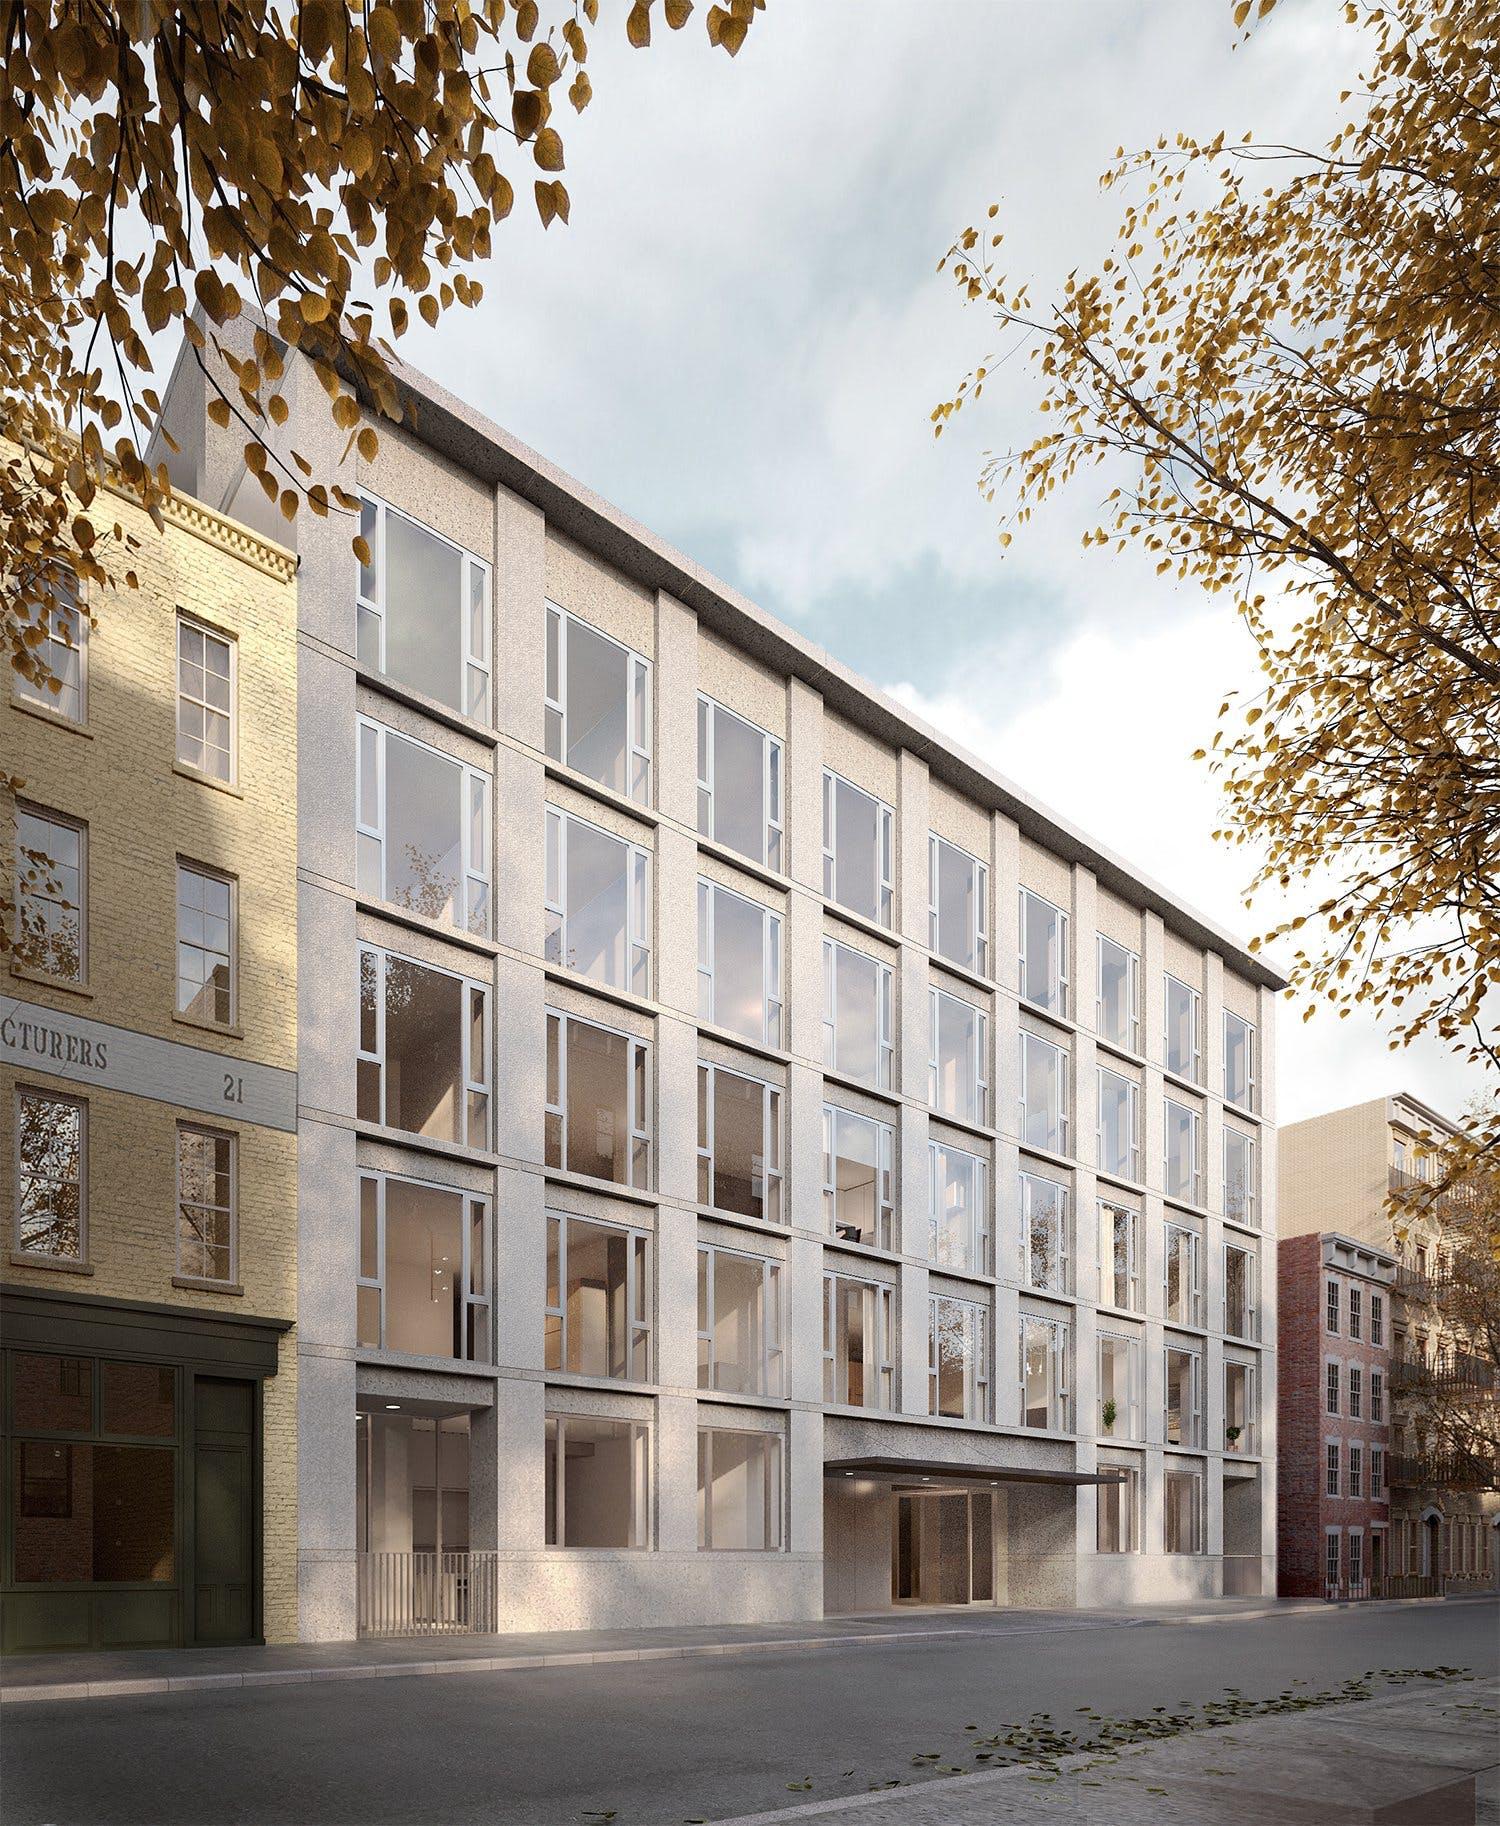 Chipperfield's Jane Street Proposal Faces Vehement